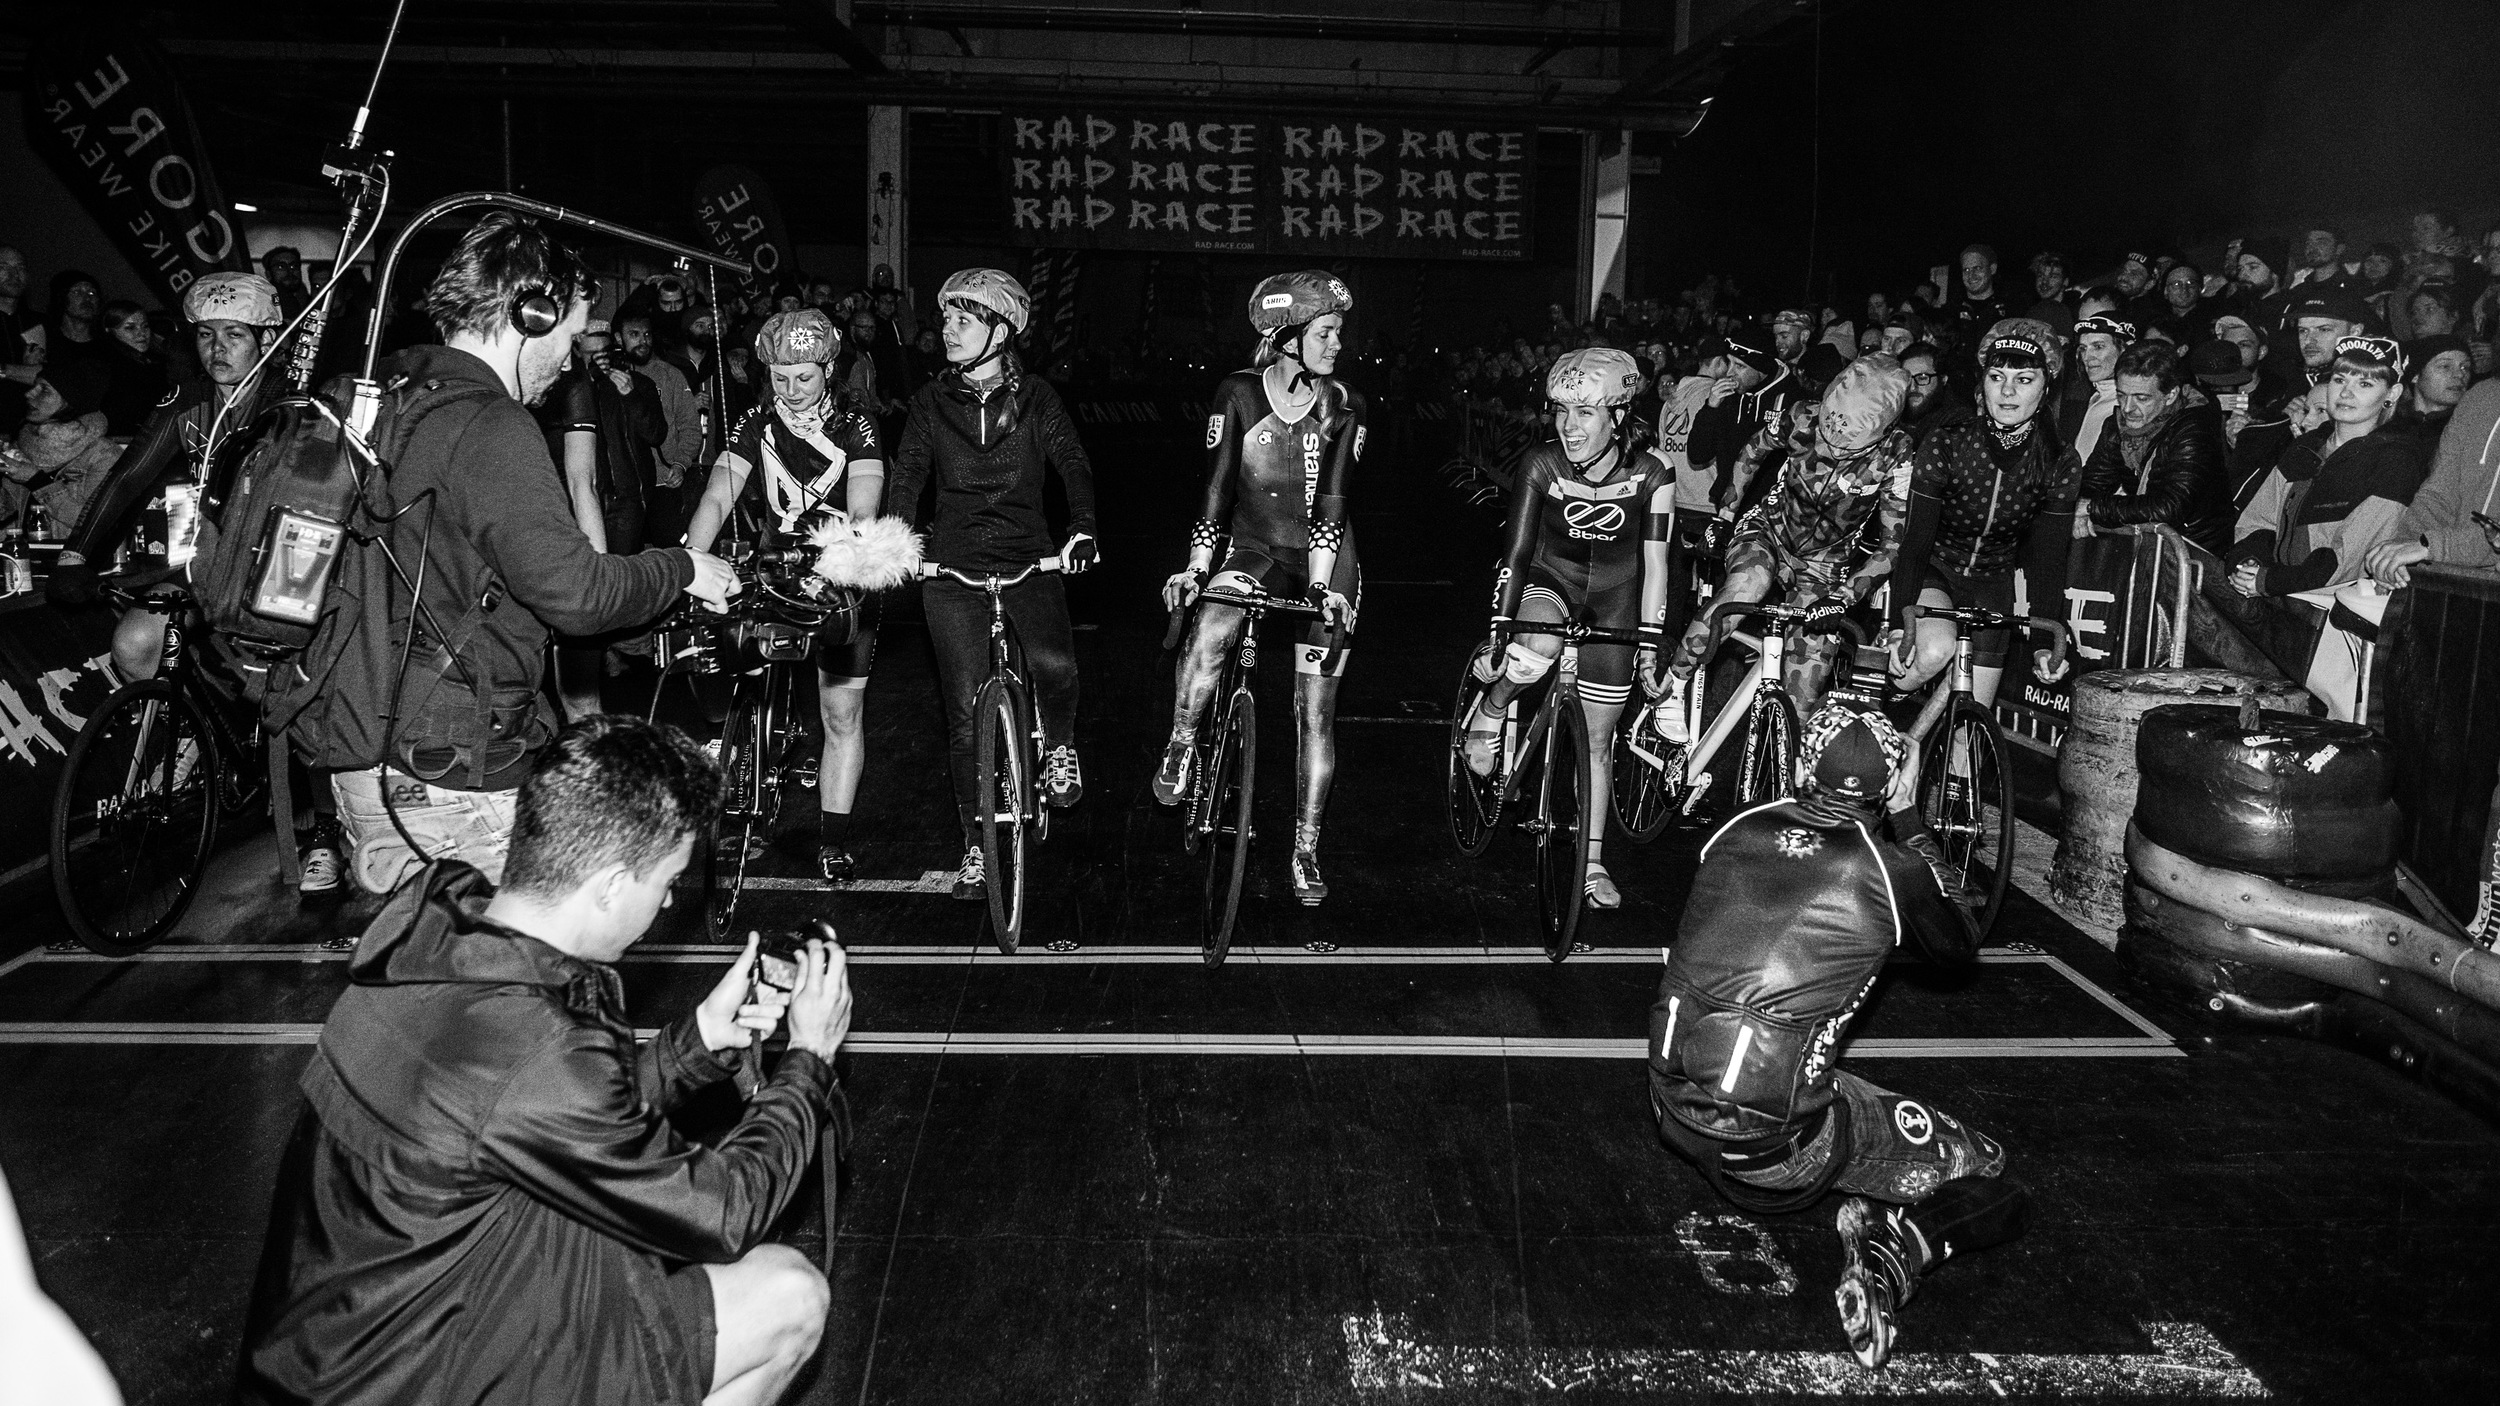 RAD RACE Last Man Standing, Berlin March 19 2016 - Shot by Drew Kaplan 54.jpg